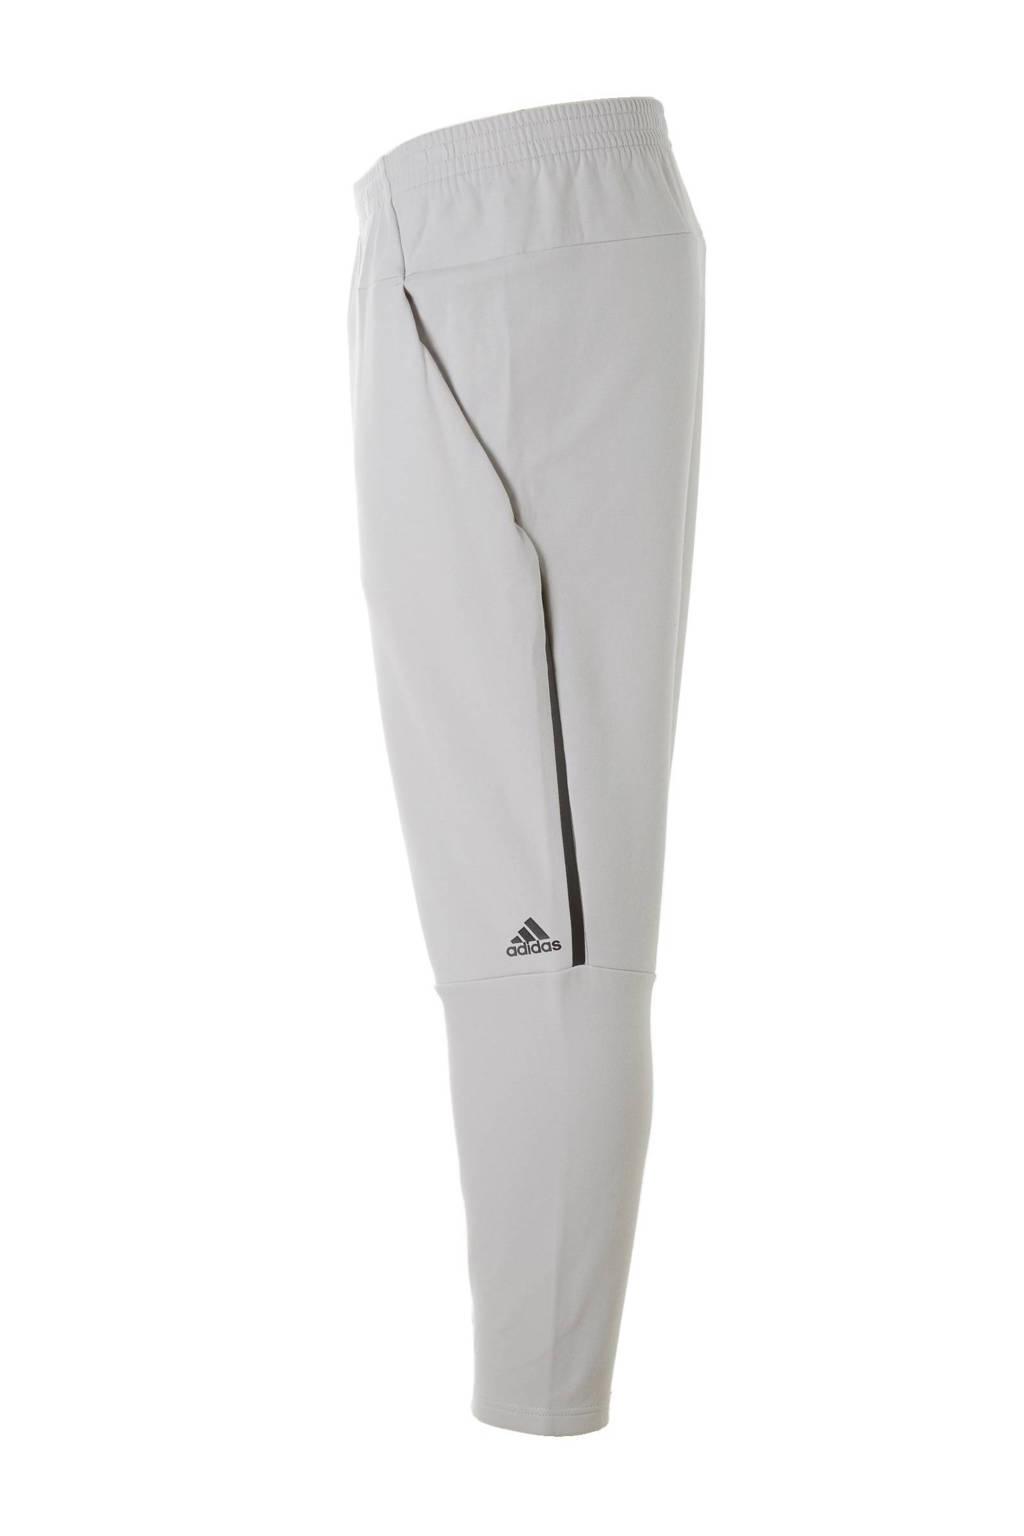 6fcbf6cc072 adidas performance ZNE joggingbroek, Lichtgrijs